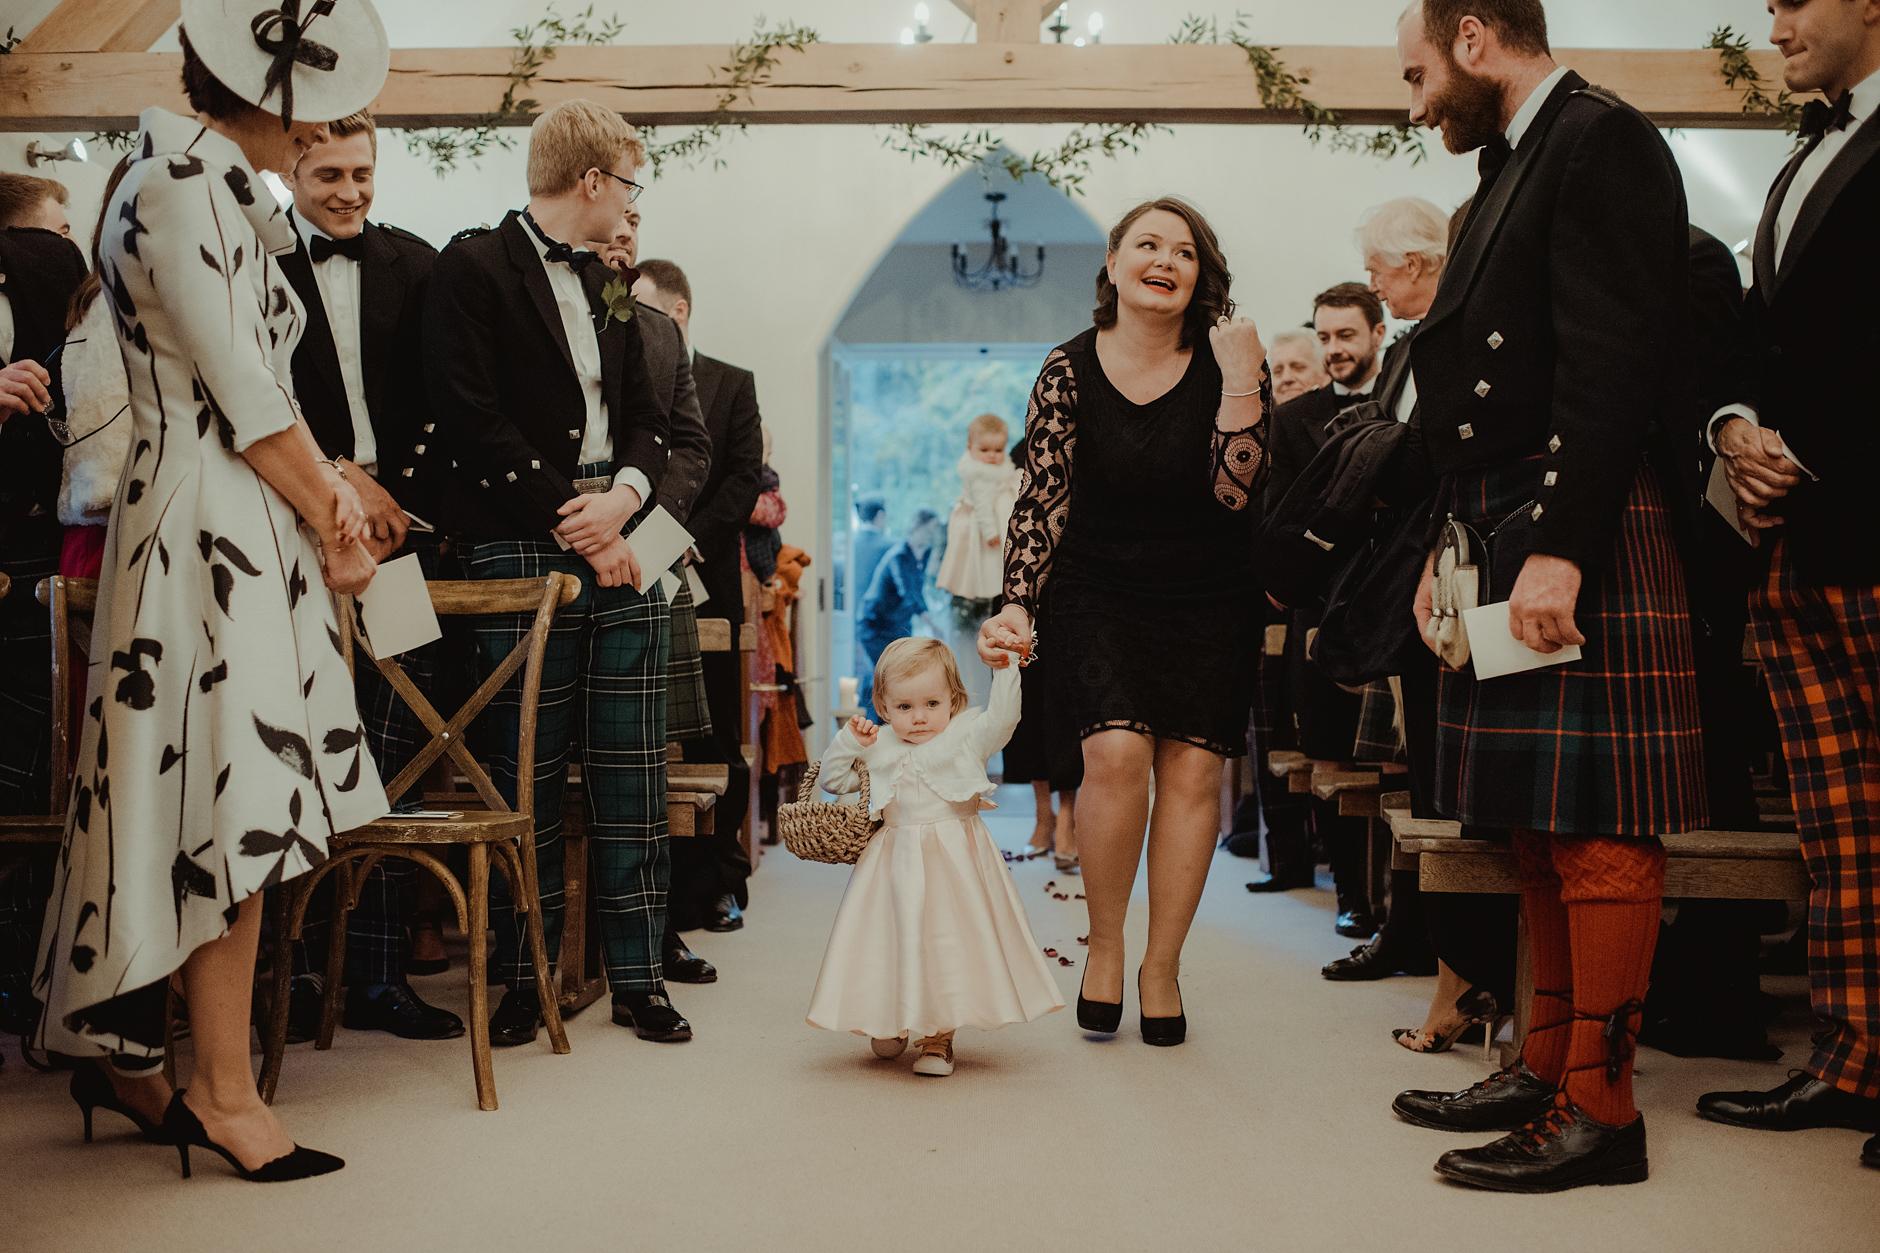 Glentruim-Wedding-Nikki-Leadbetter-Photography-73.jpg